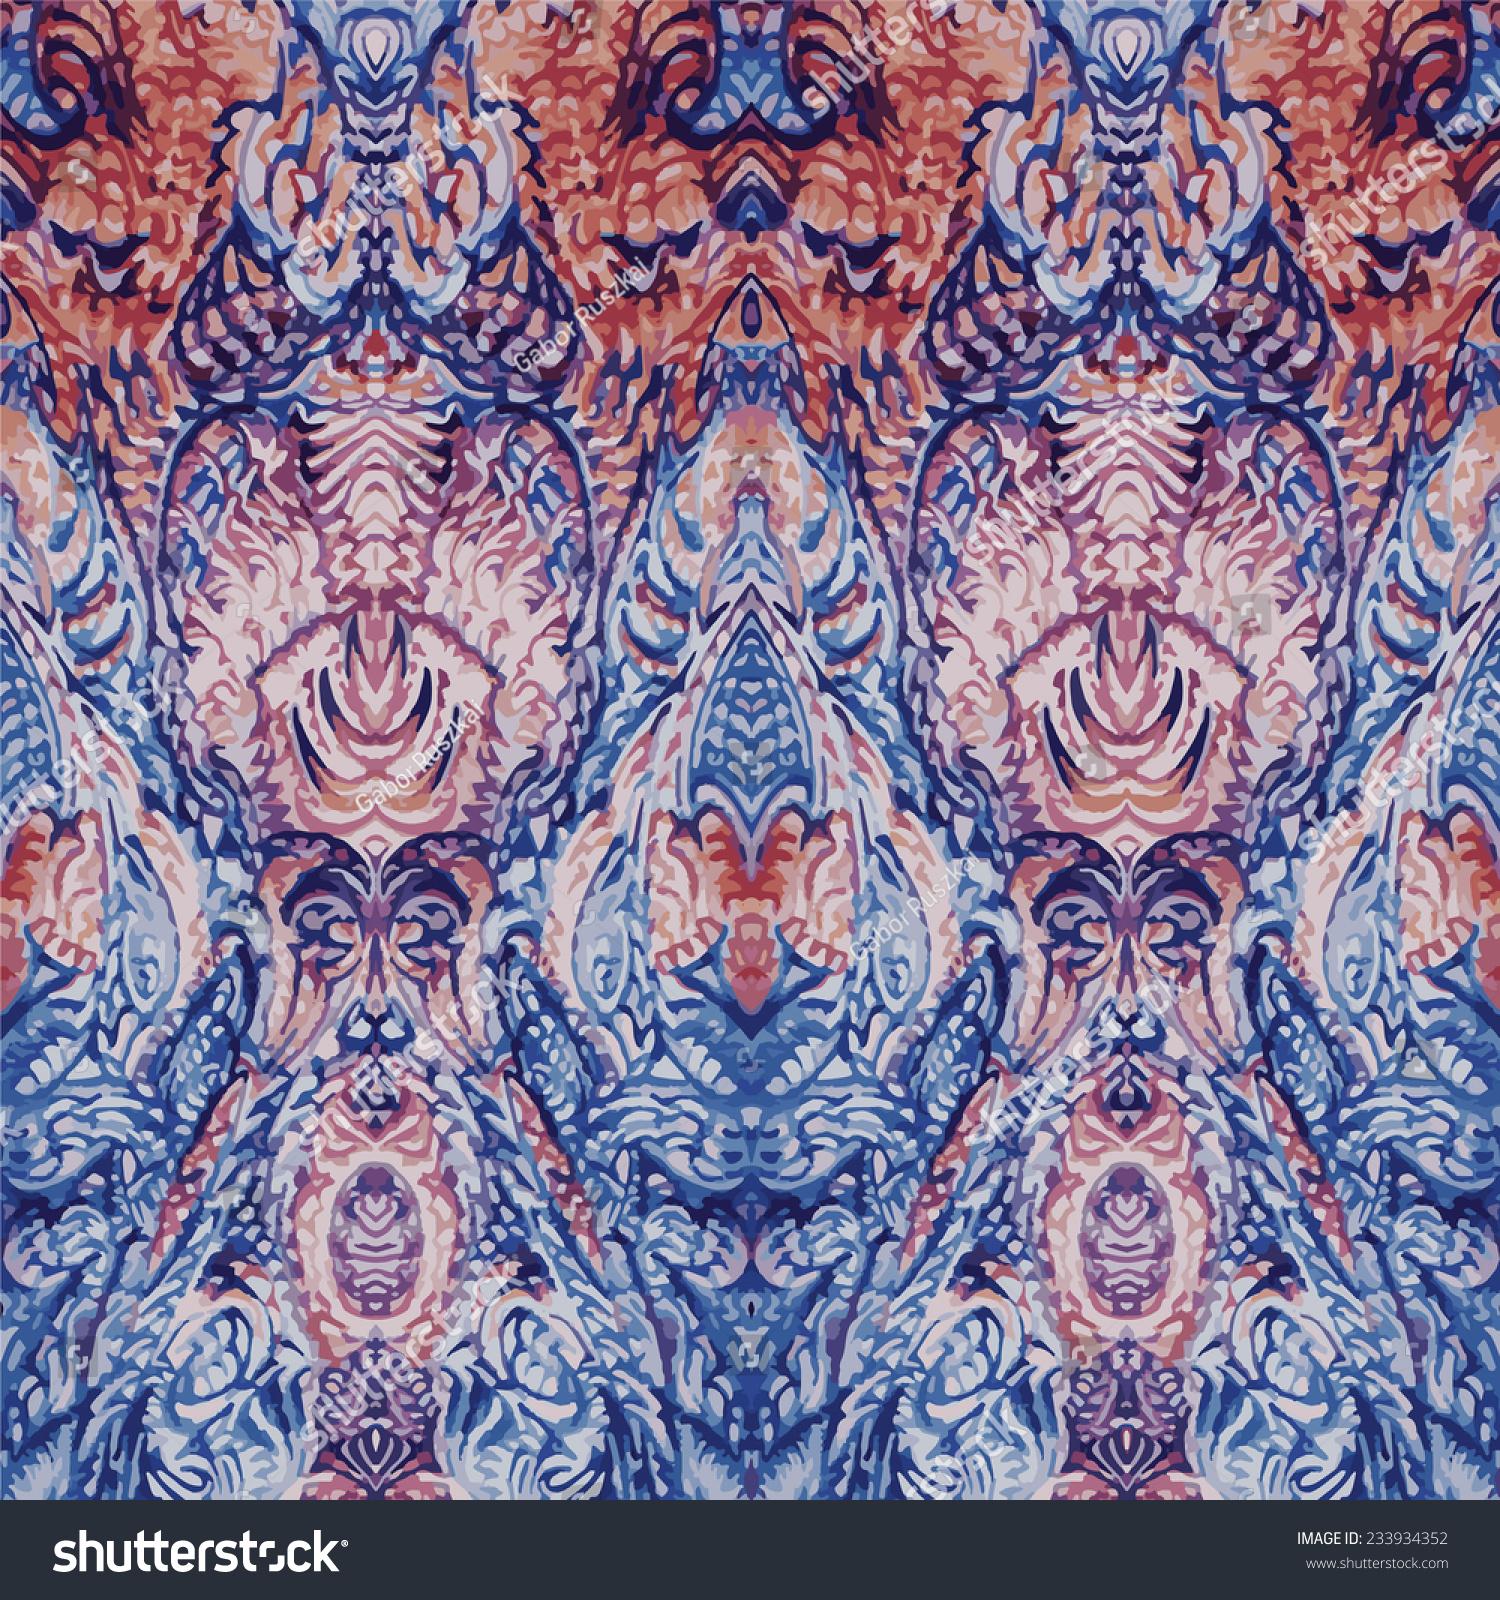 vintage tapestry pattern lager-vektor 233934352